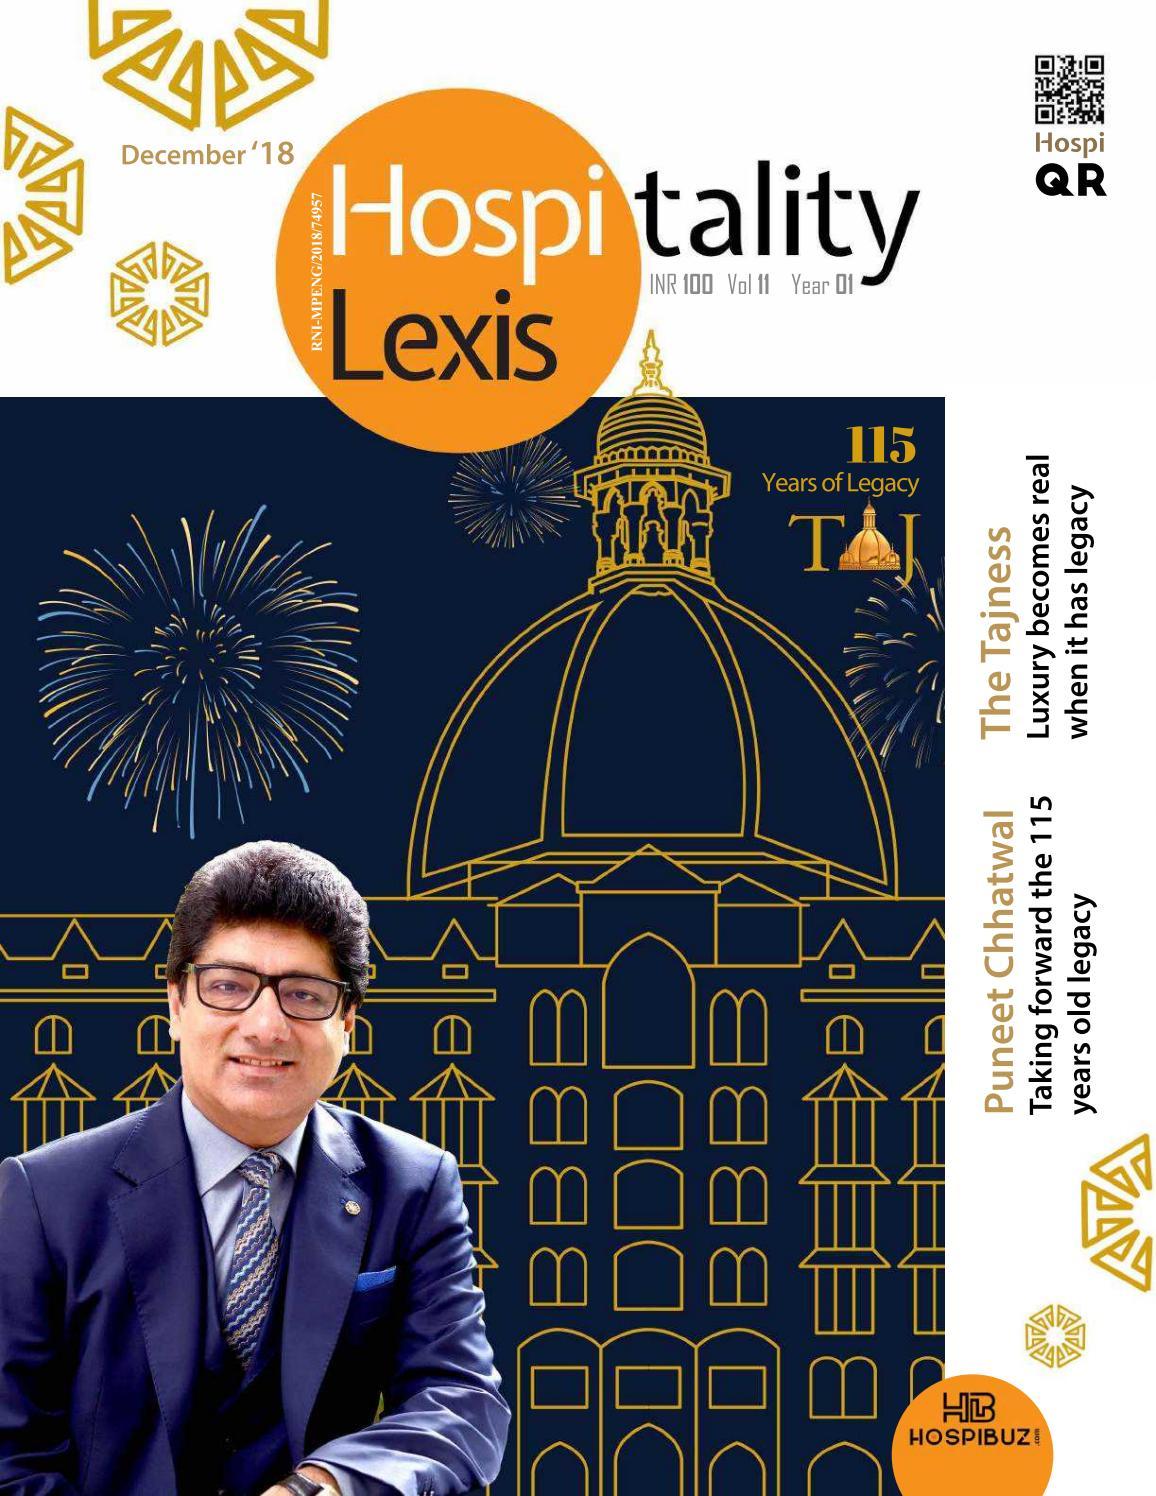 Hospitality Lexis December 2018 By Hospitality Lexis Issuu